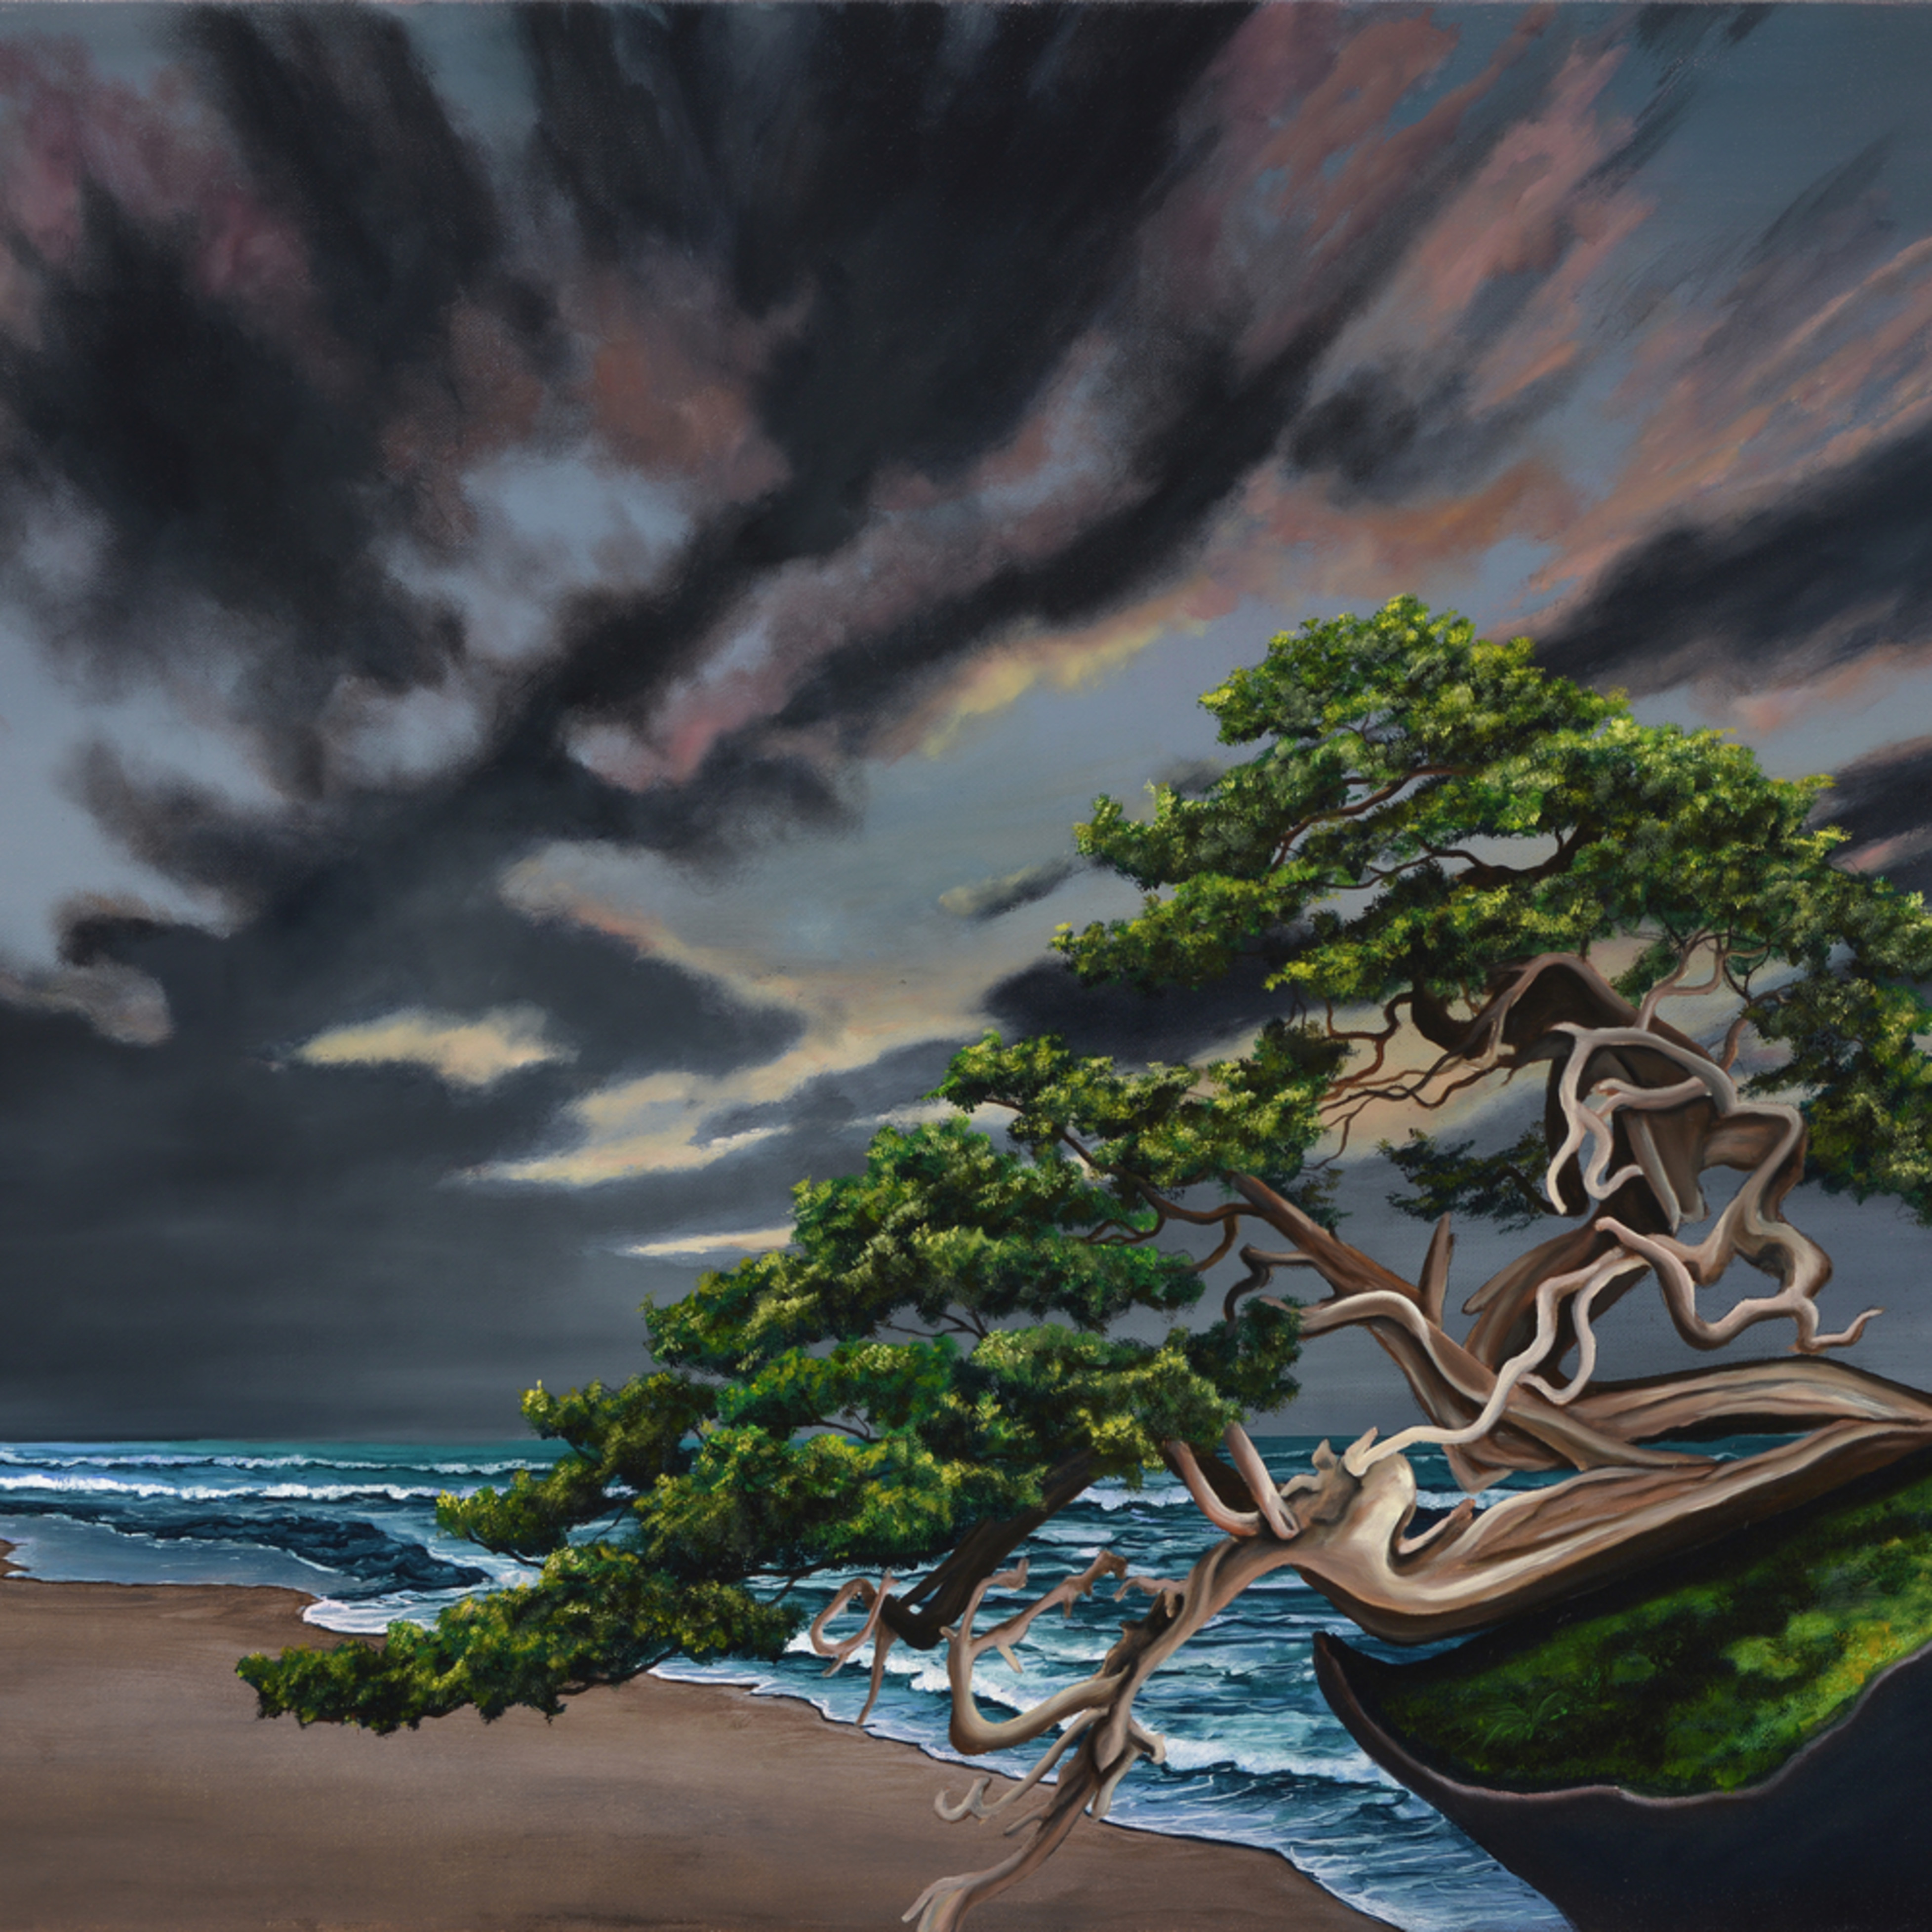 10  bonsai on the beach oil on canvas by monica marquez gatica mmg art studio fpduoc